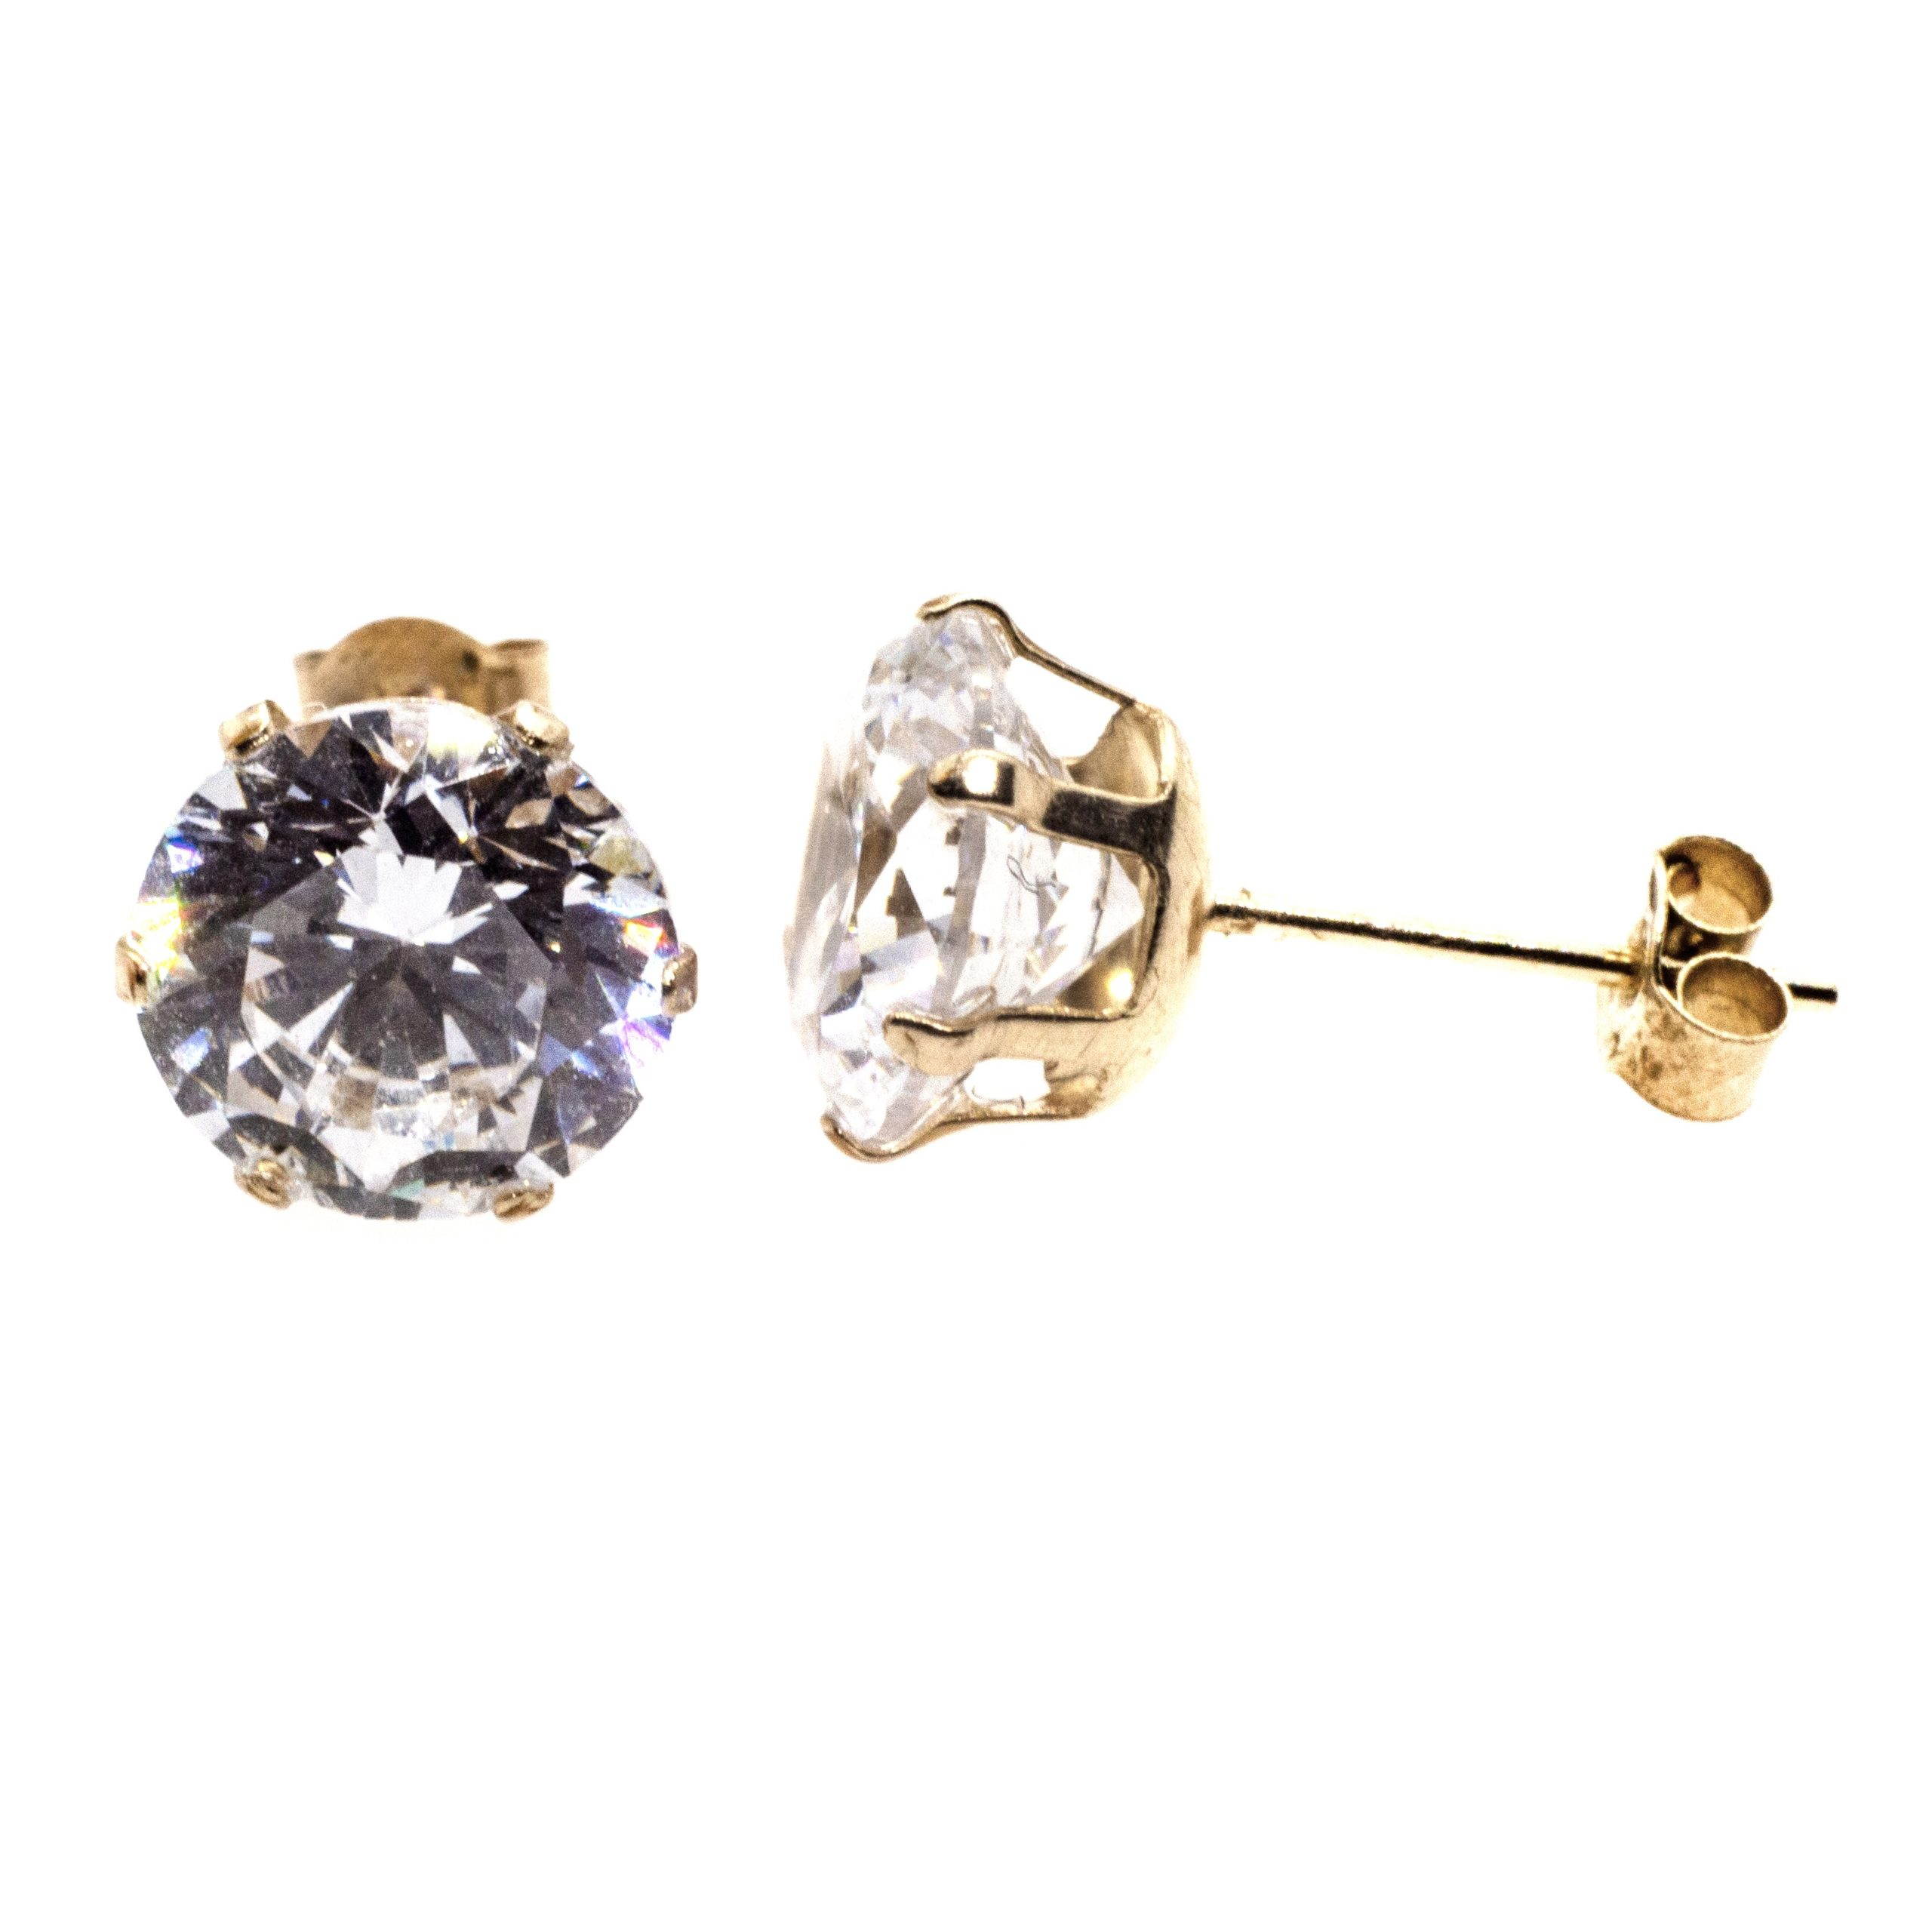 7mm CZ stud earrings 9ct yellow gold alt 4